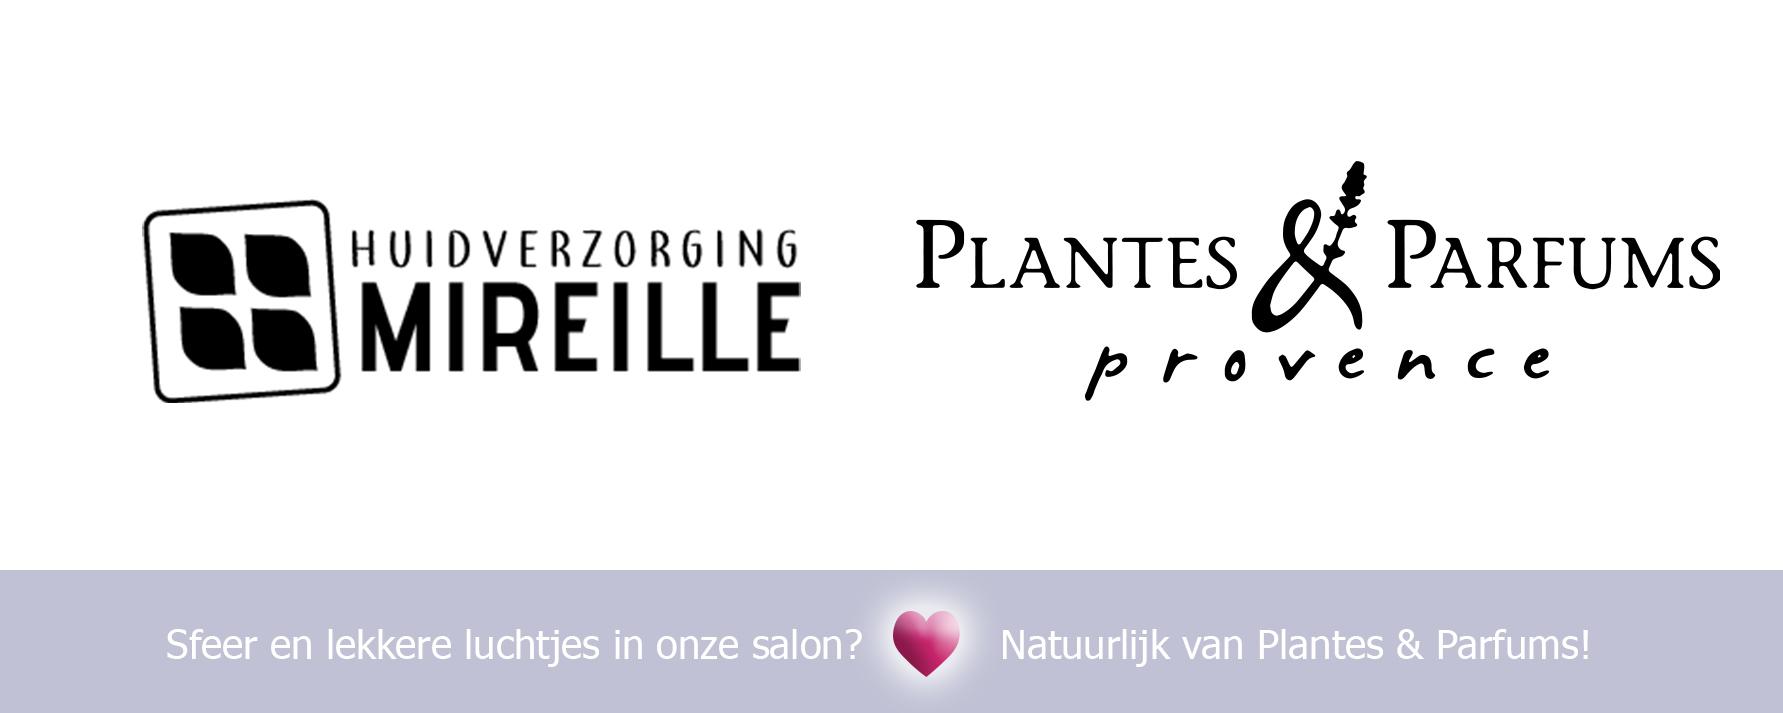 Plantes & Parfums geurkaars